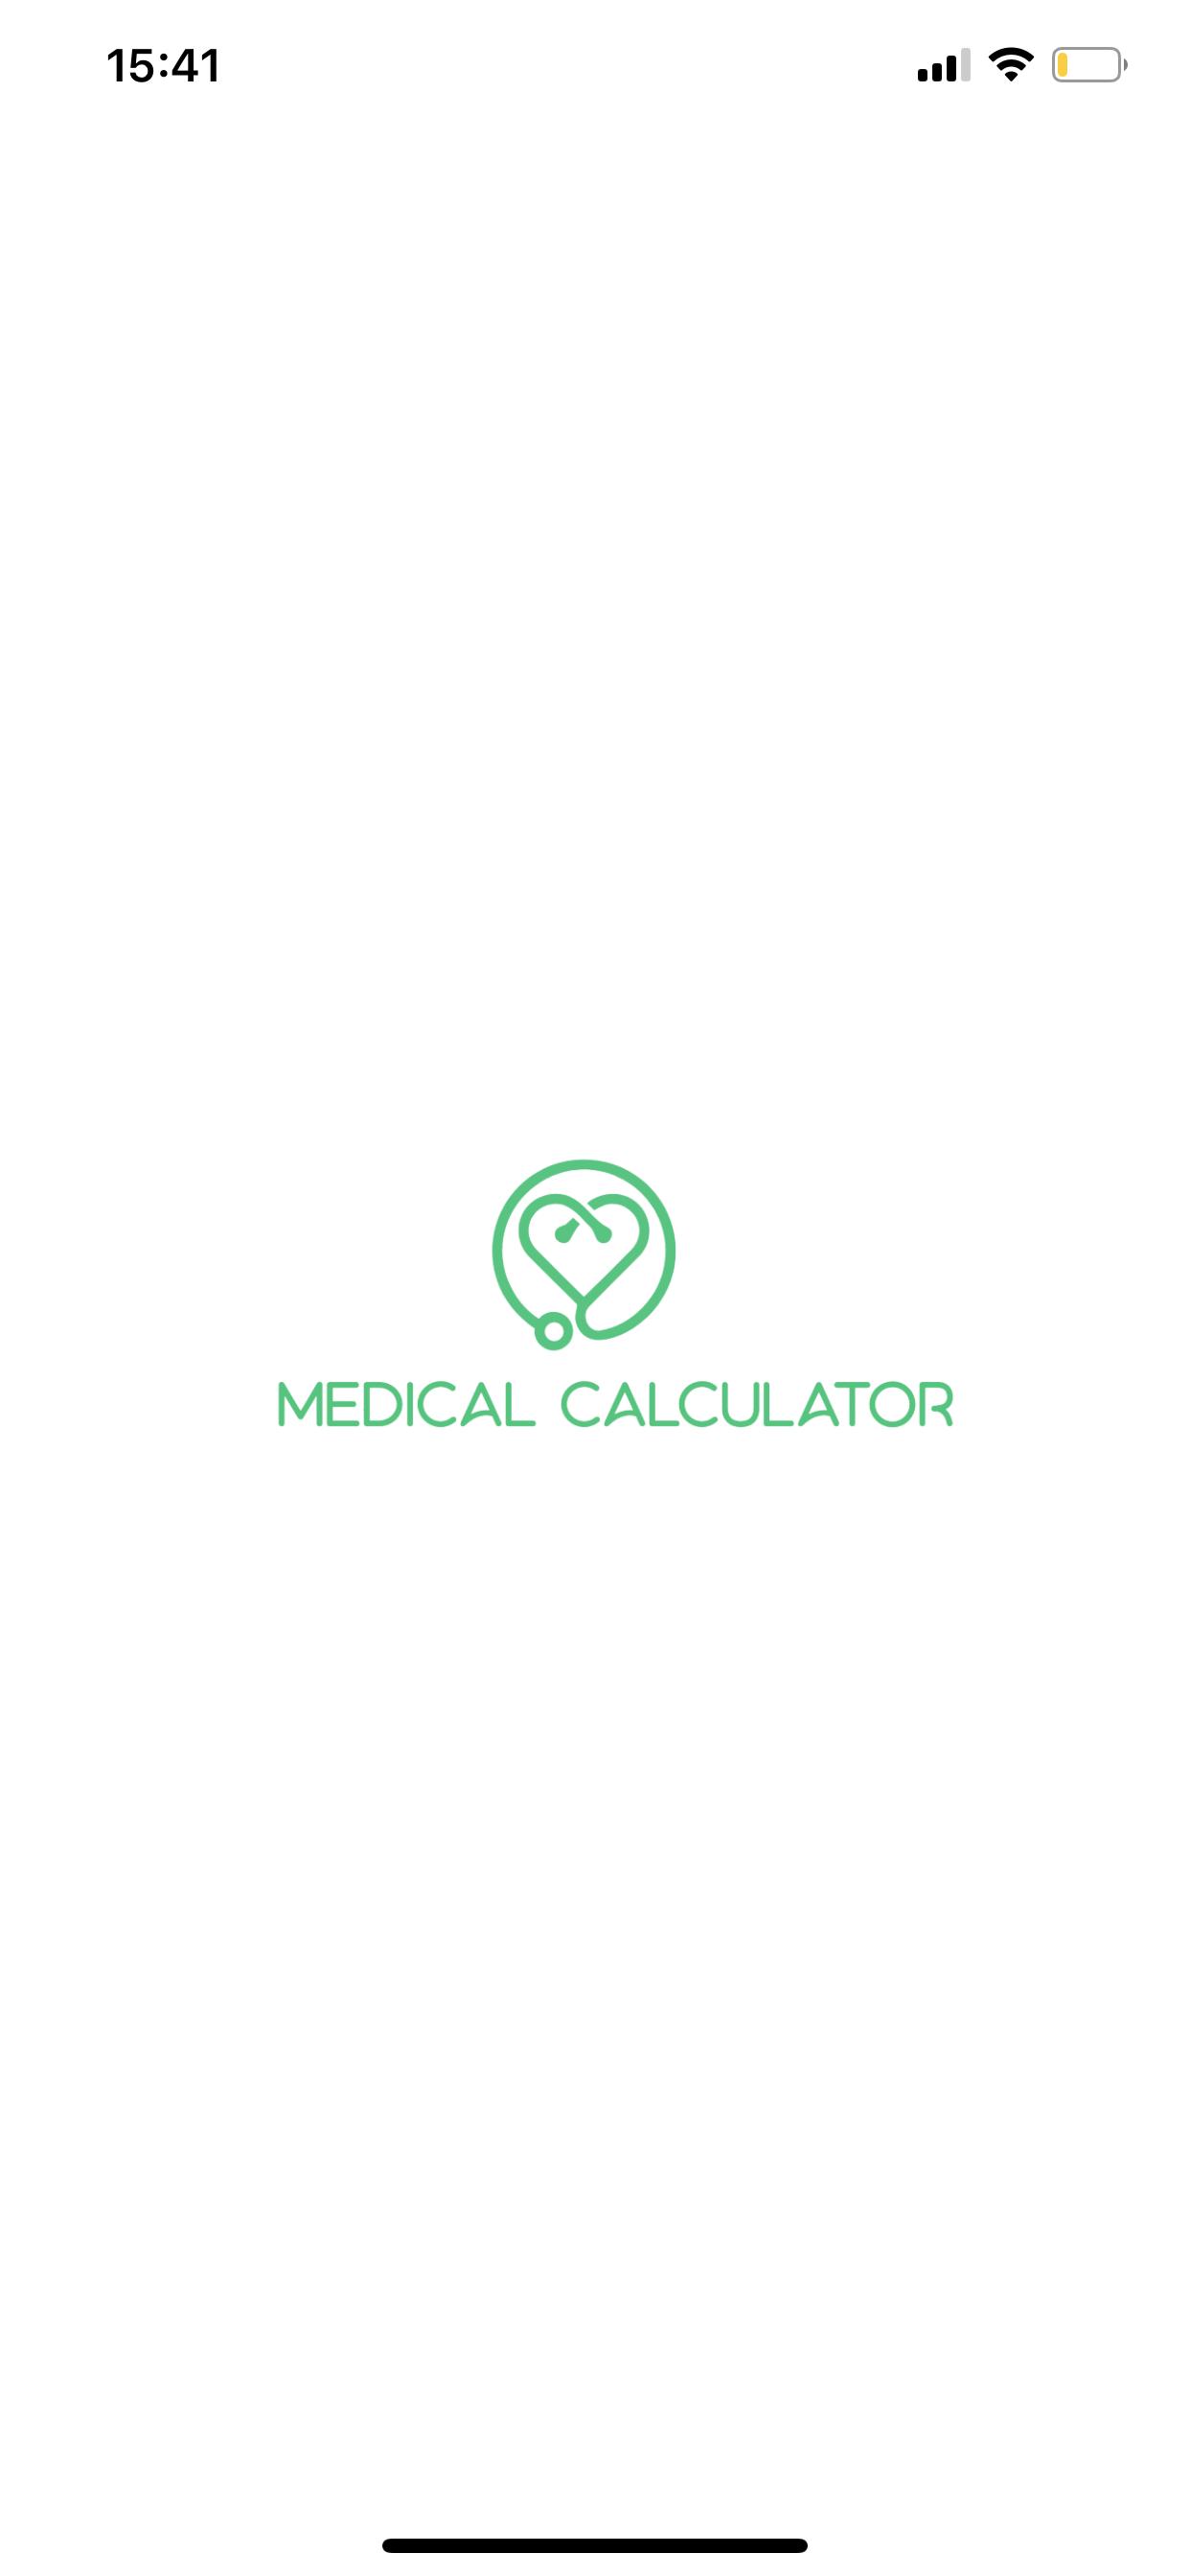 Covid Medical Calculator